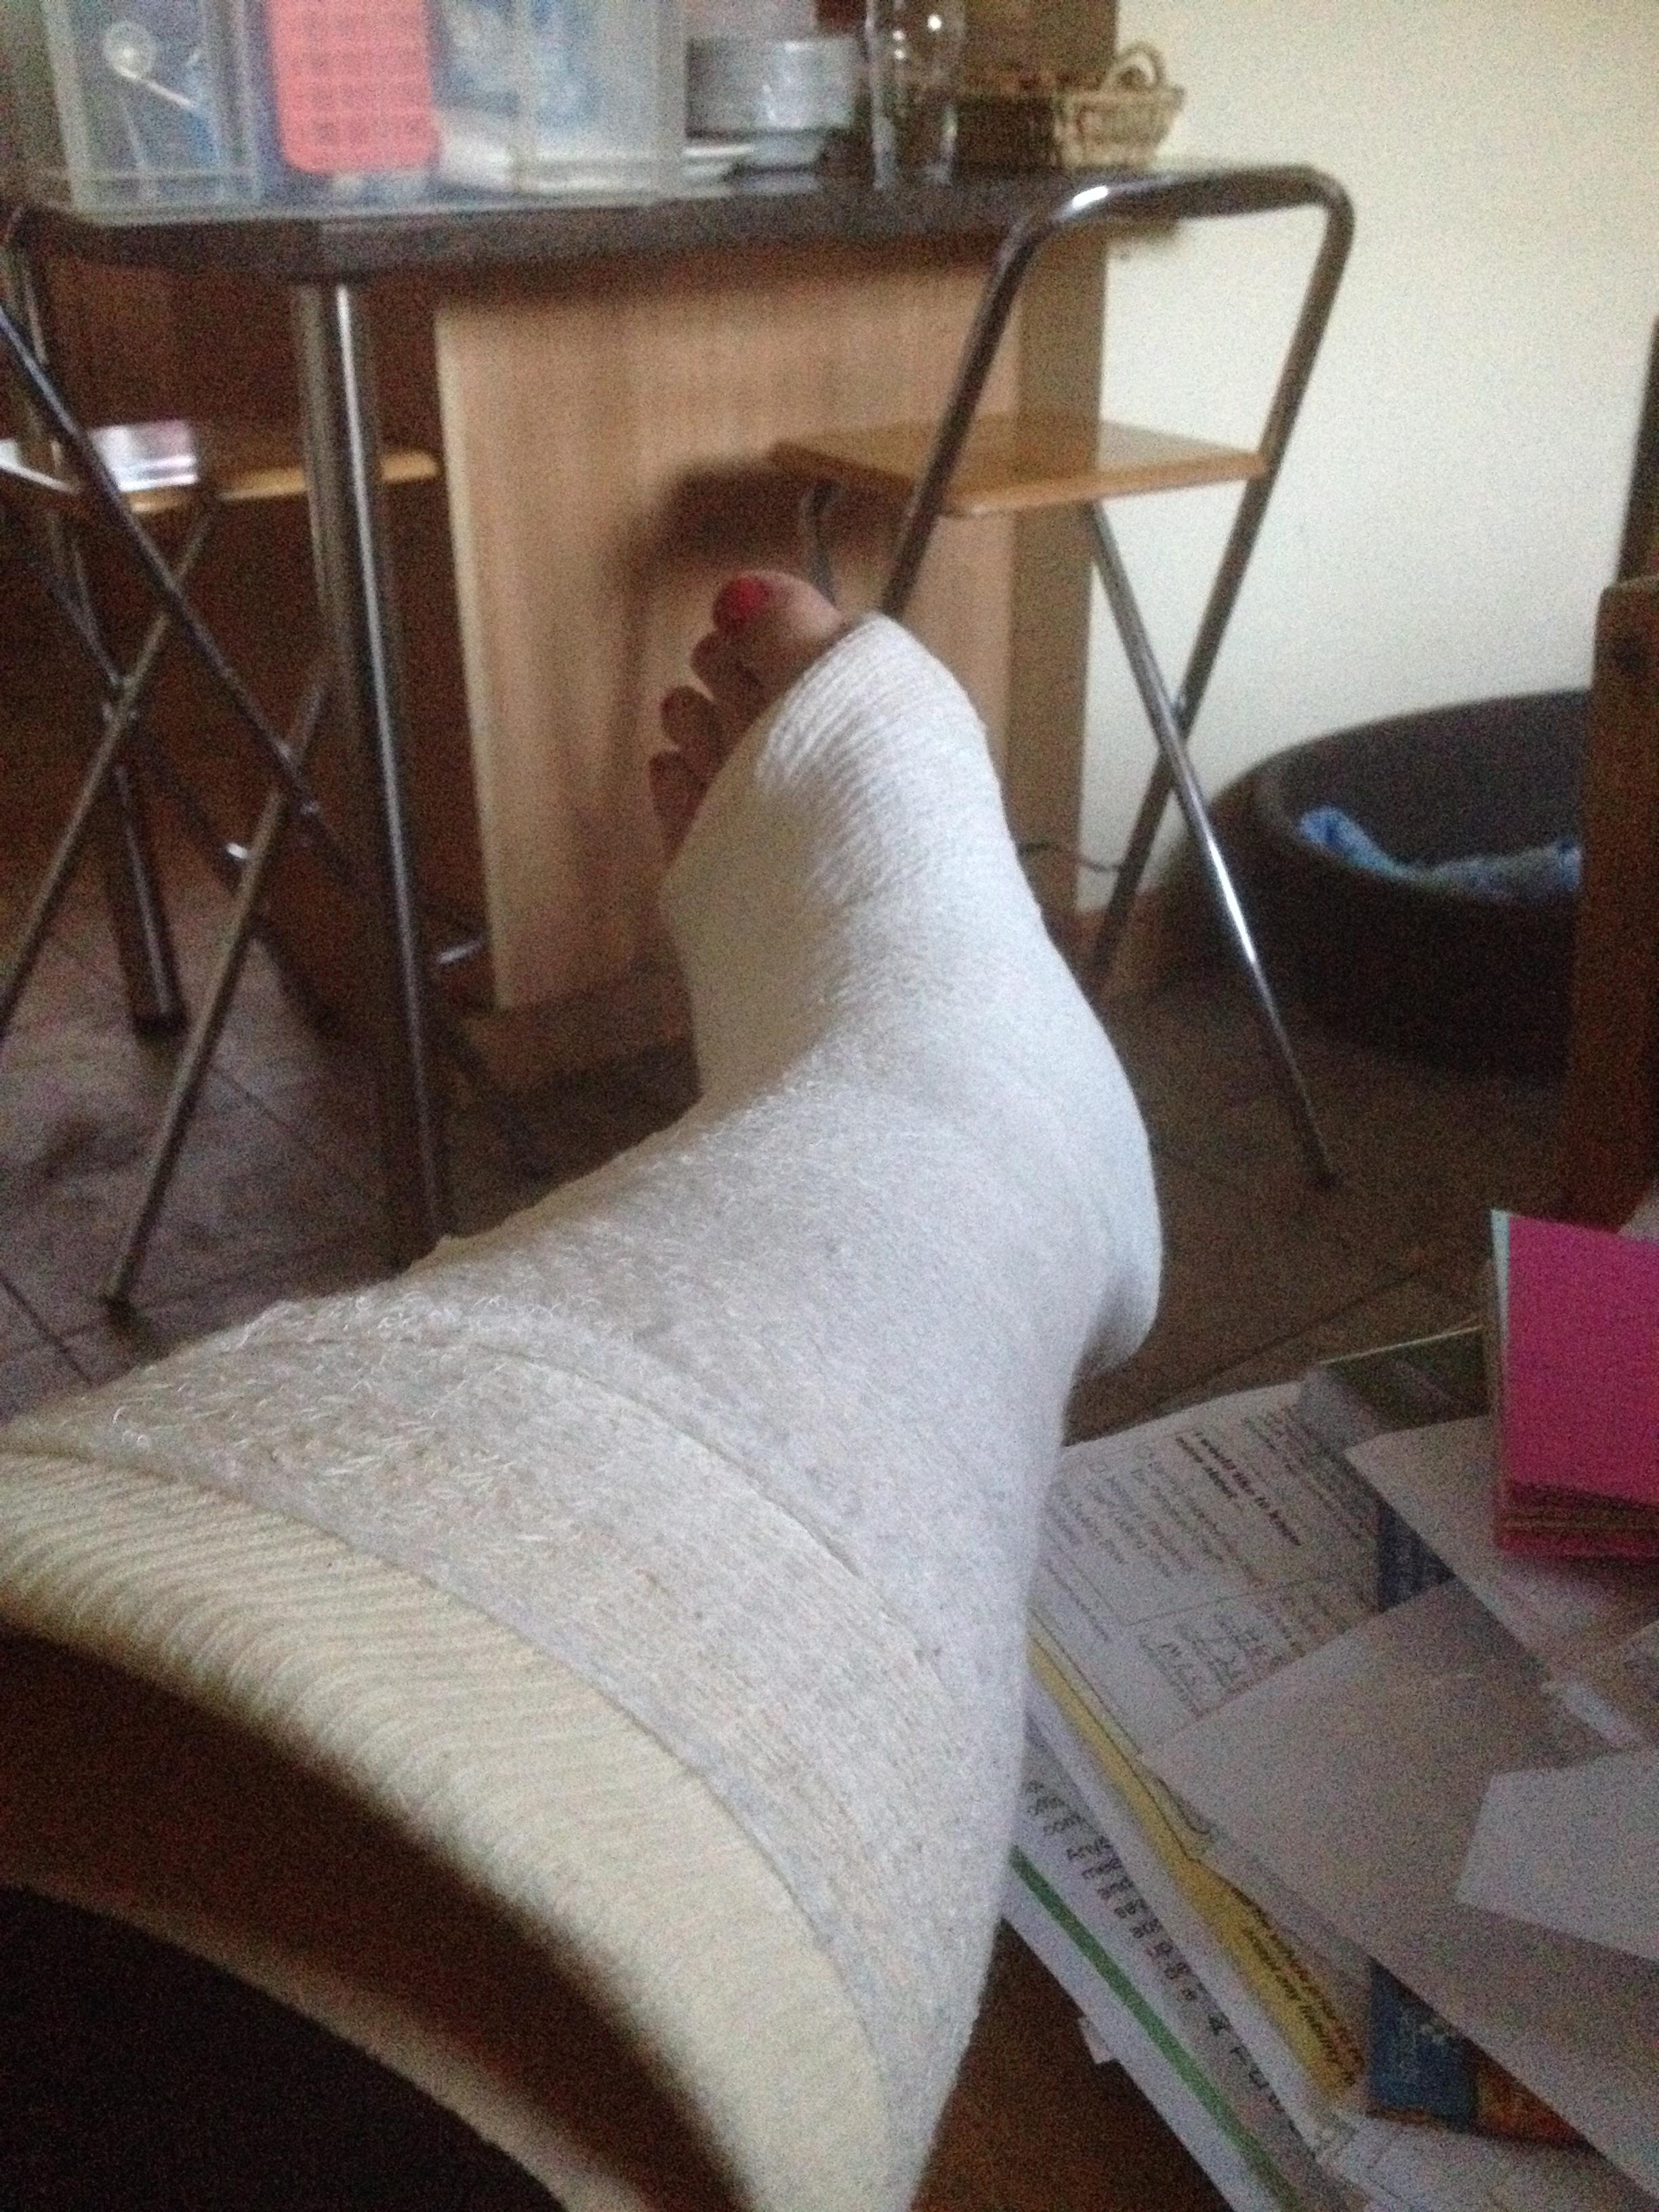 Foot in plaster